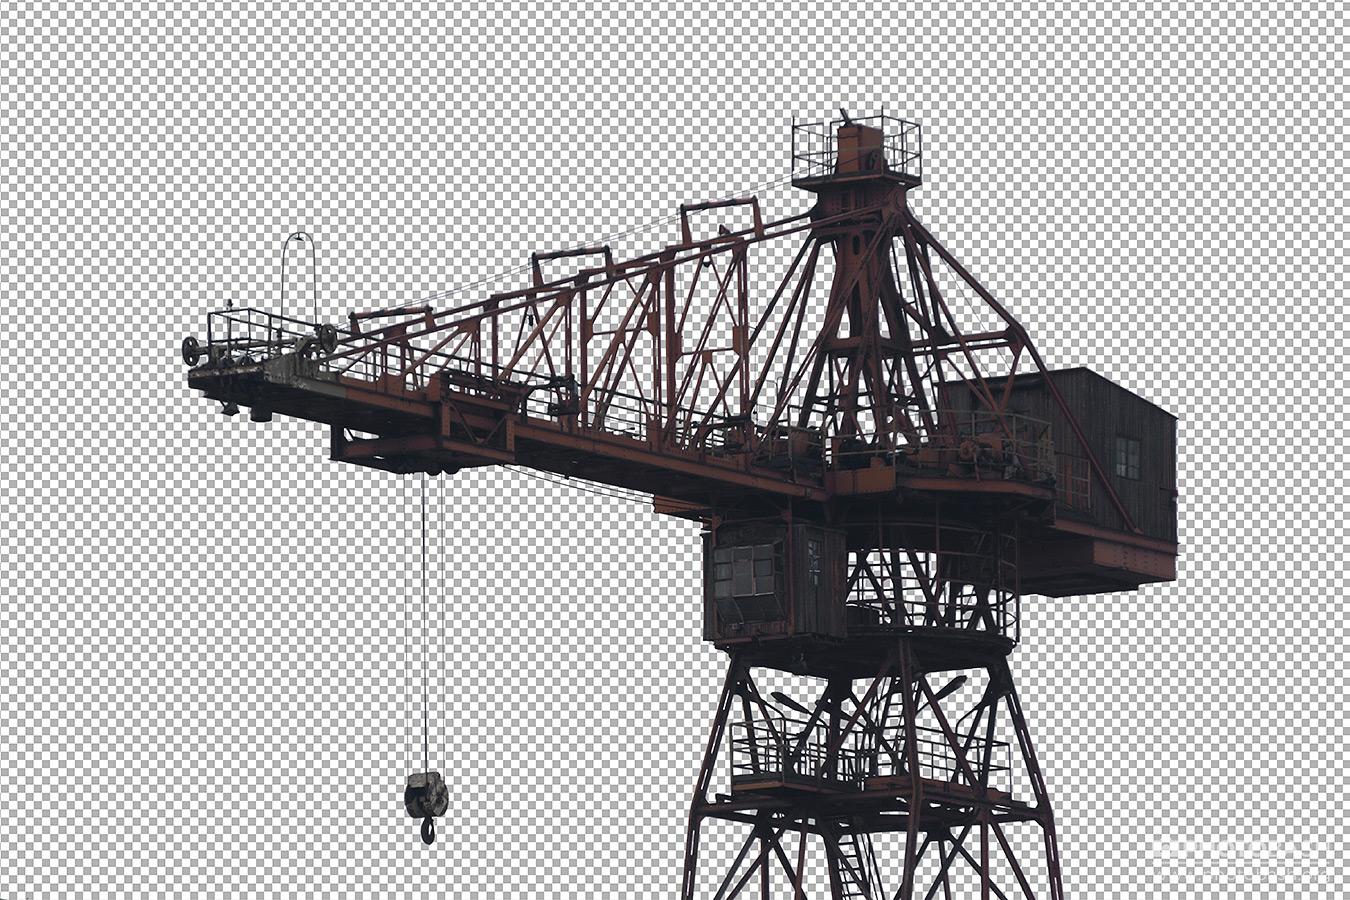 Shipyard-Cranes-Industrial-Masked-Alpha.jpg